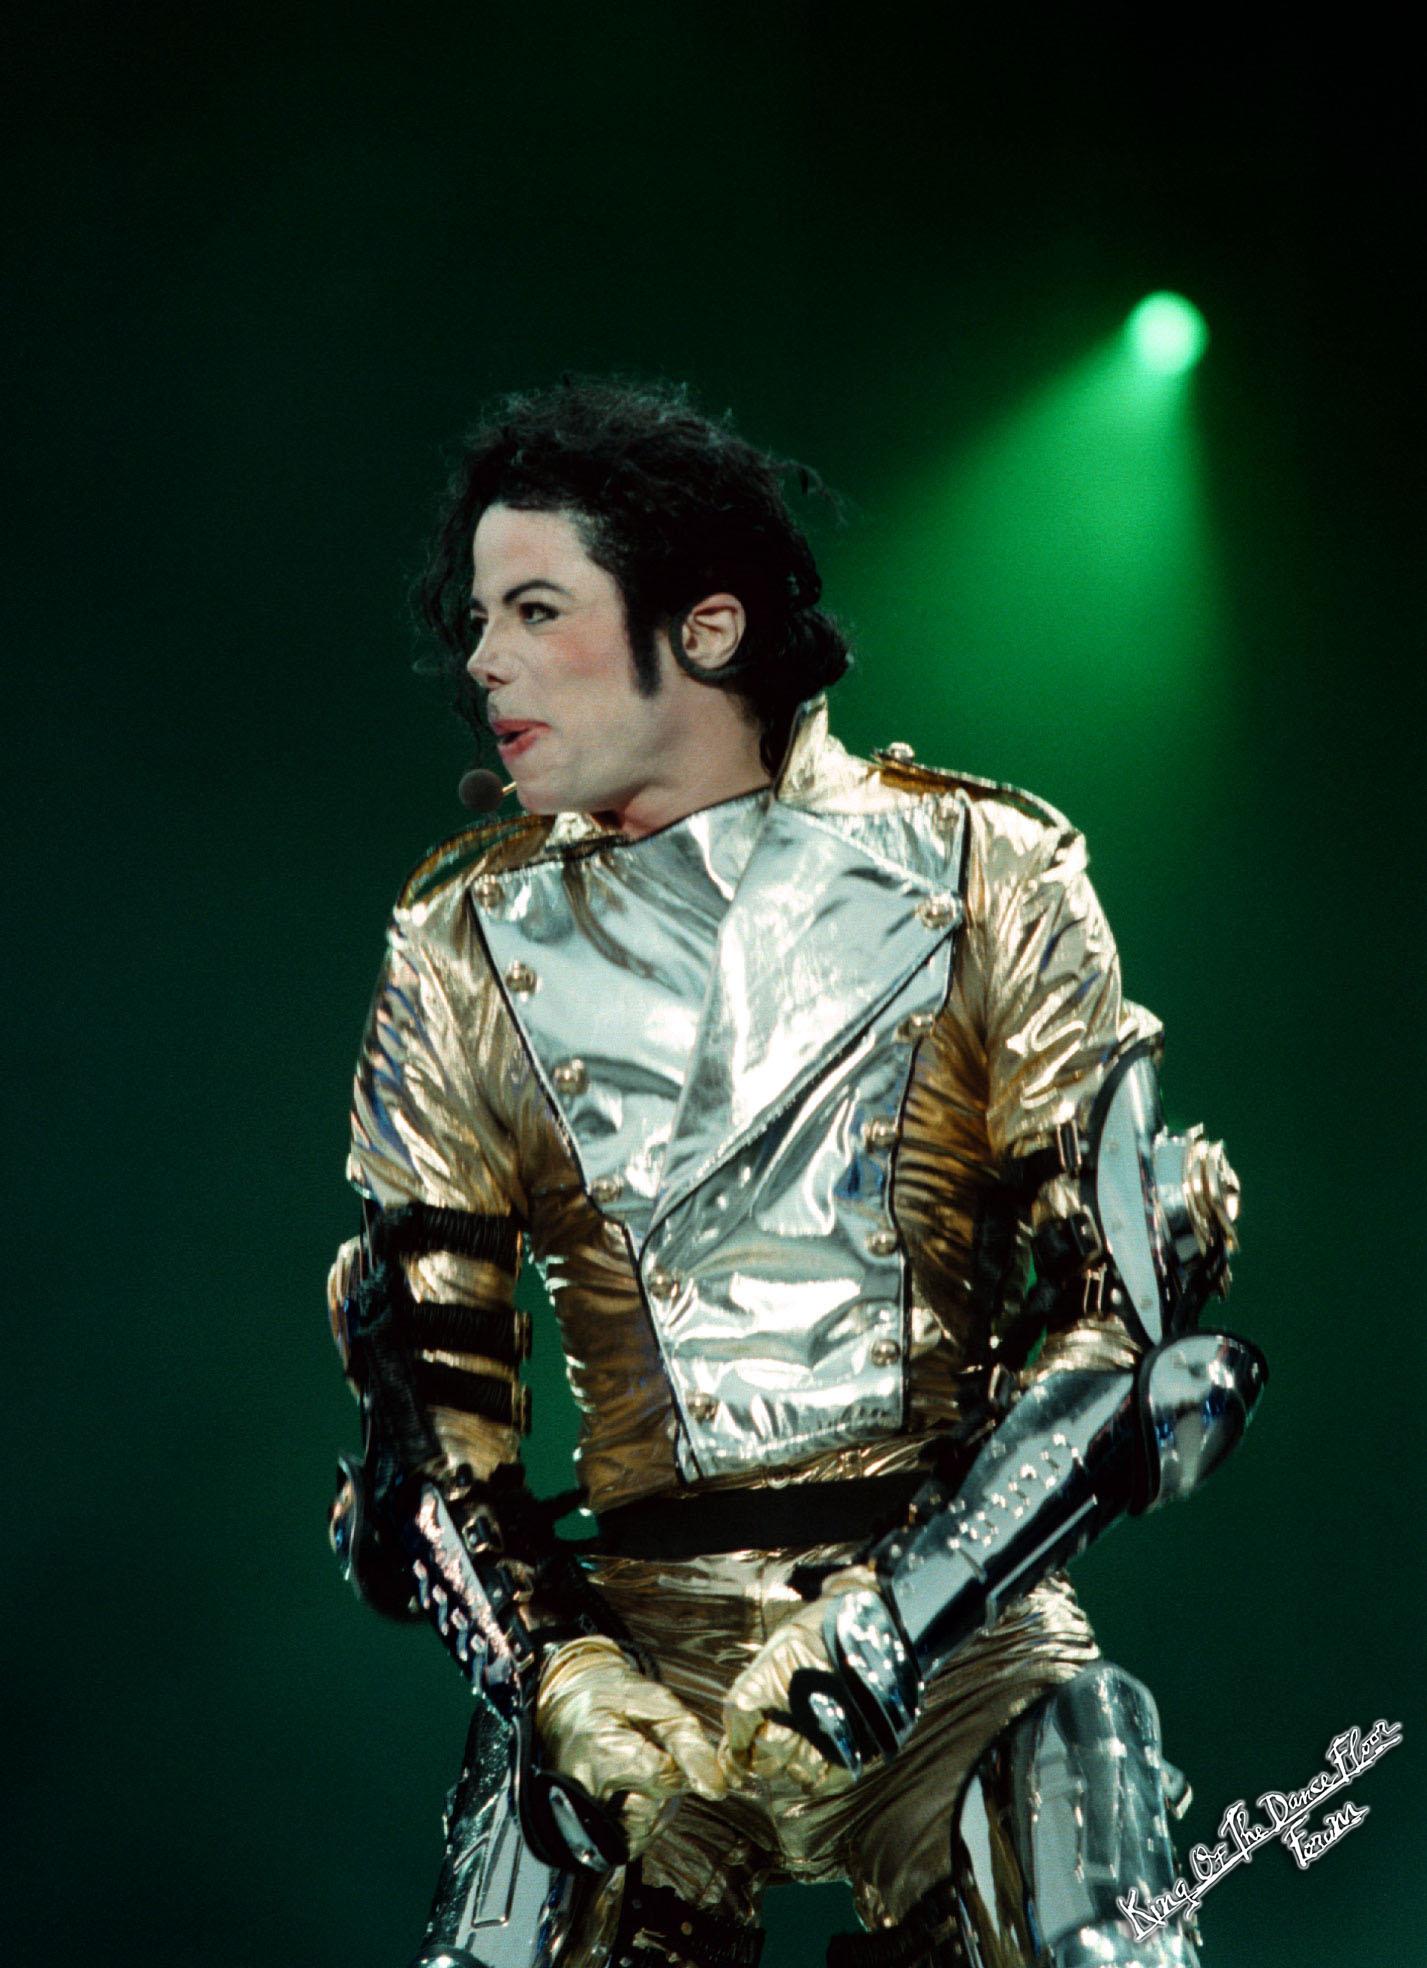 Michael-HIStory-tour-michael-jackson-29831218-1427-1968.jpg (1427×1968)